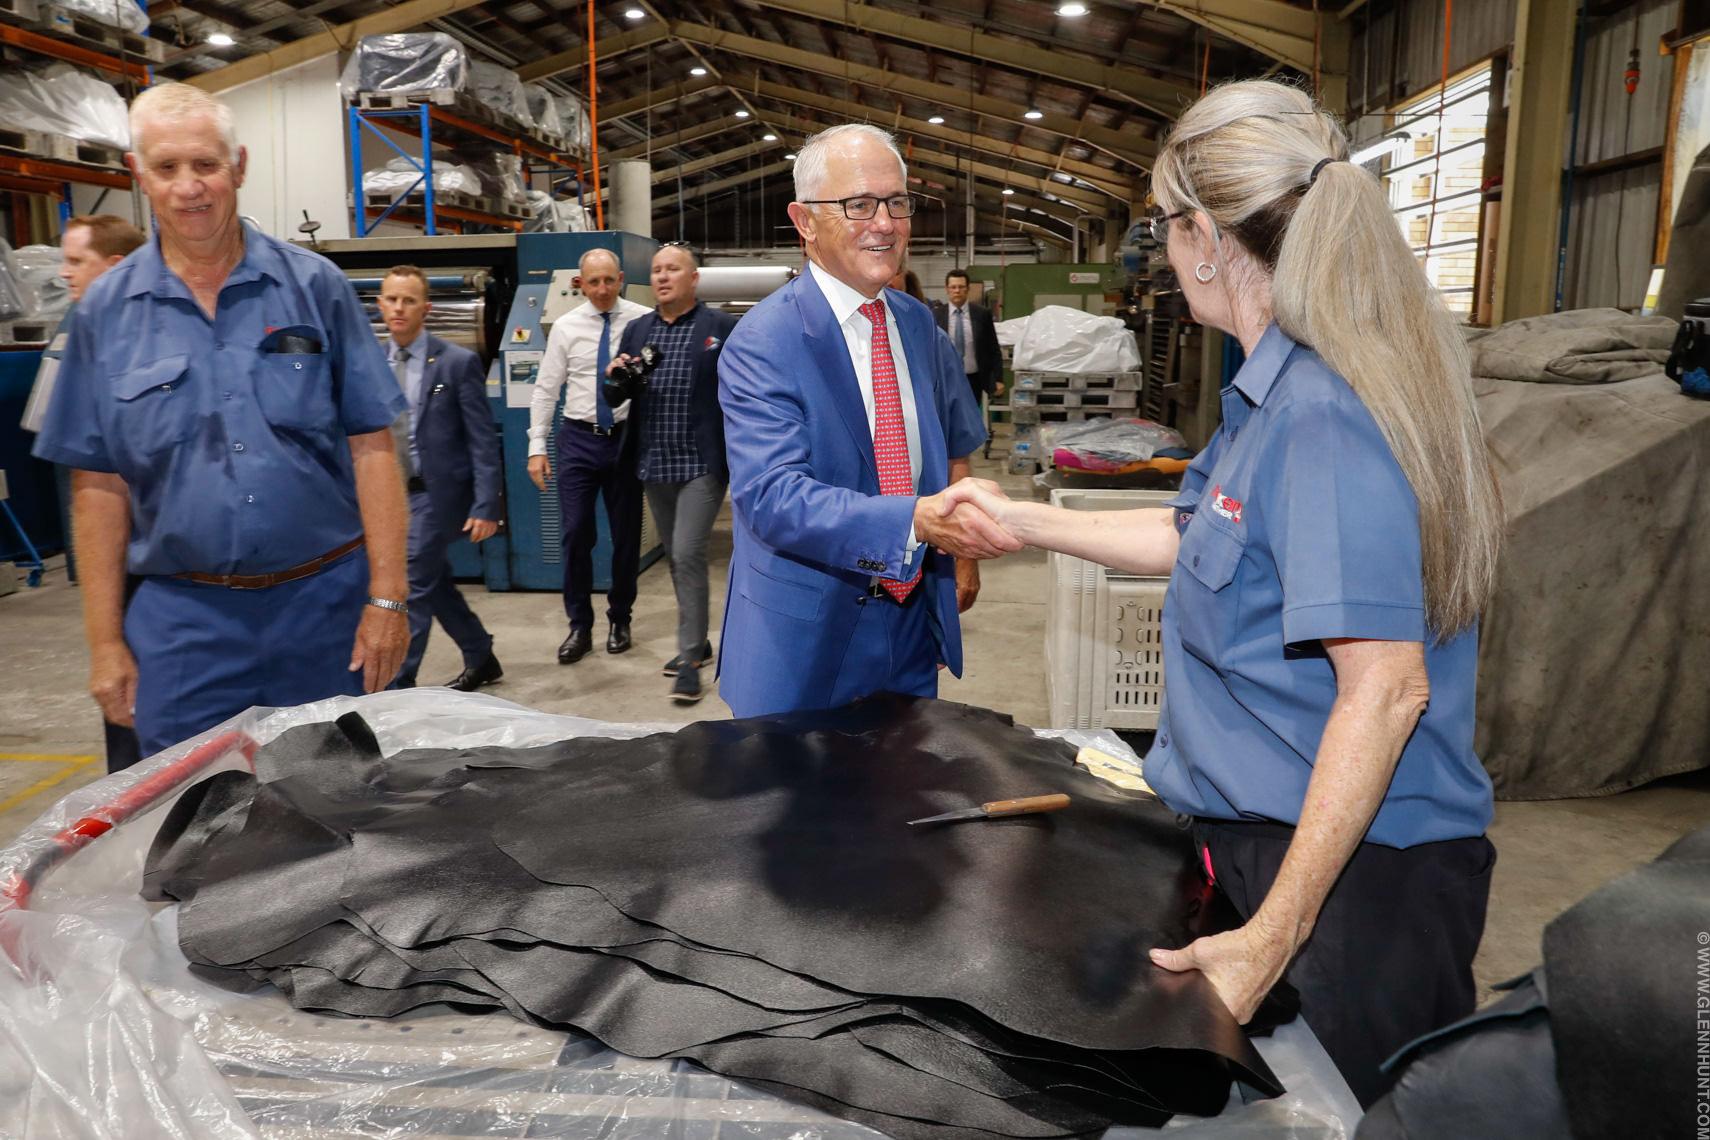 Malcolm Turnbull Brisbane Visit